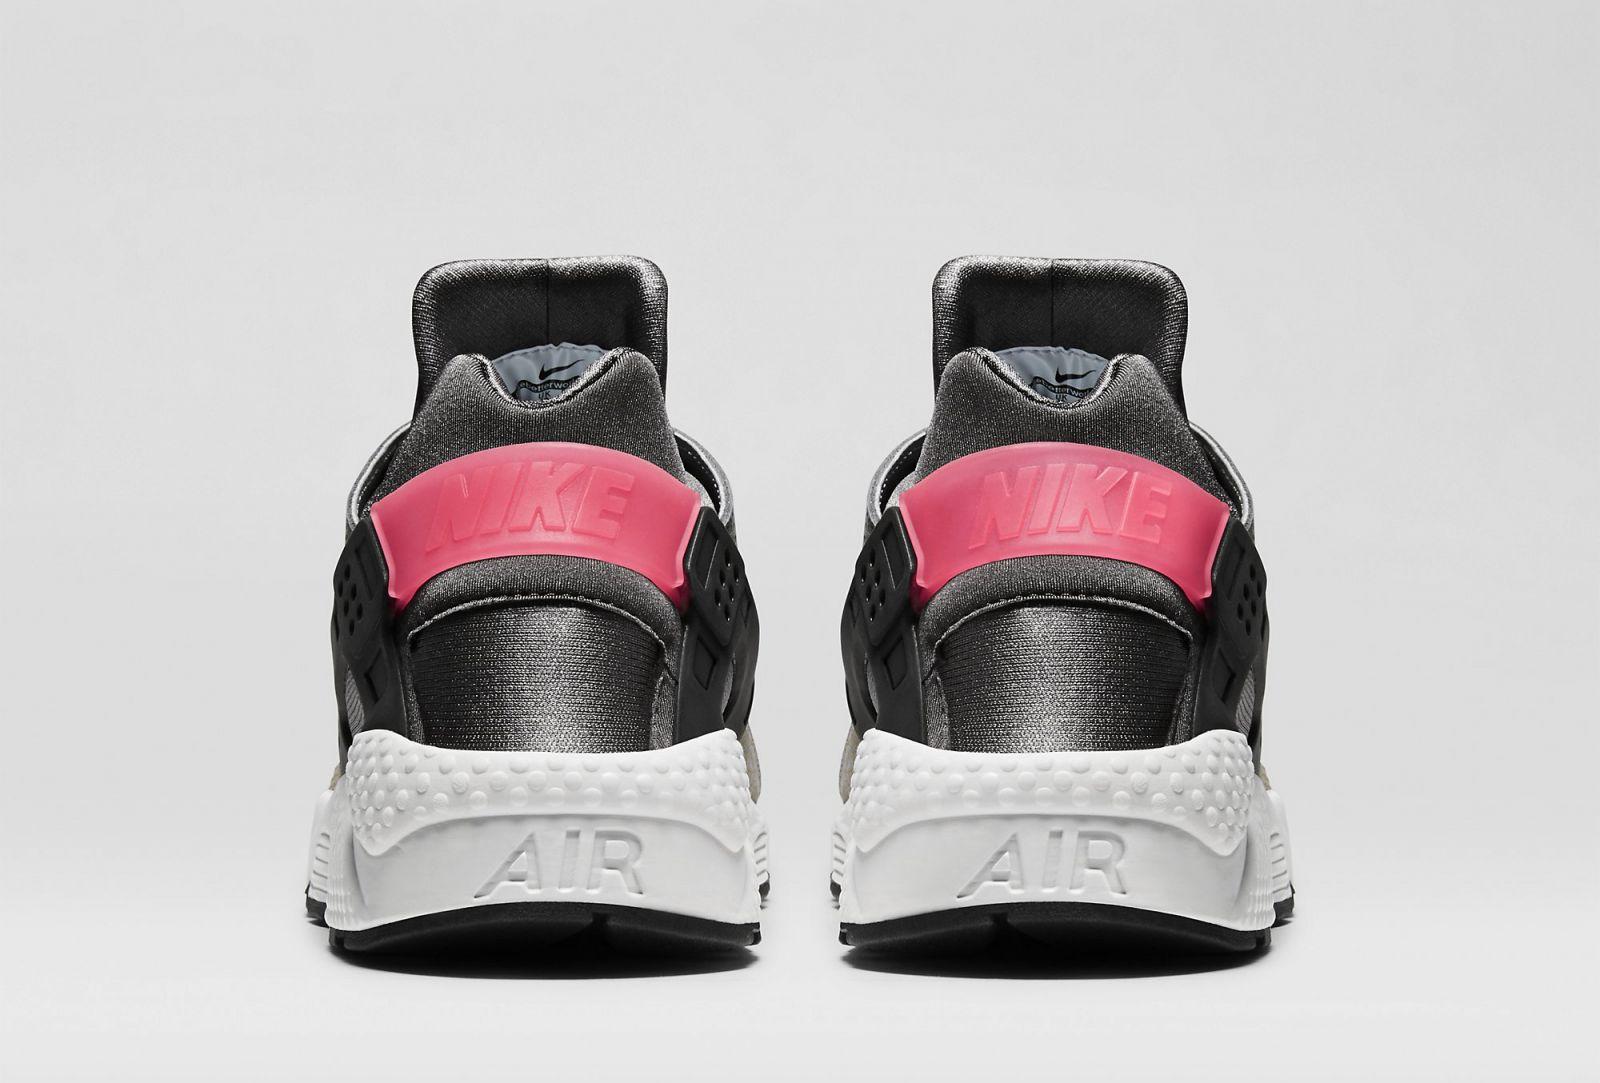 the best attitude 4046e a5a19 Nike Air Huarache Run Release Date: 11/26/14. Color: Cool Grey/Black-Medium  Ash-Hyper Punch Style #: 704830-062. Price: $110